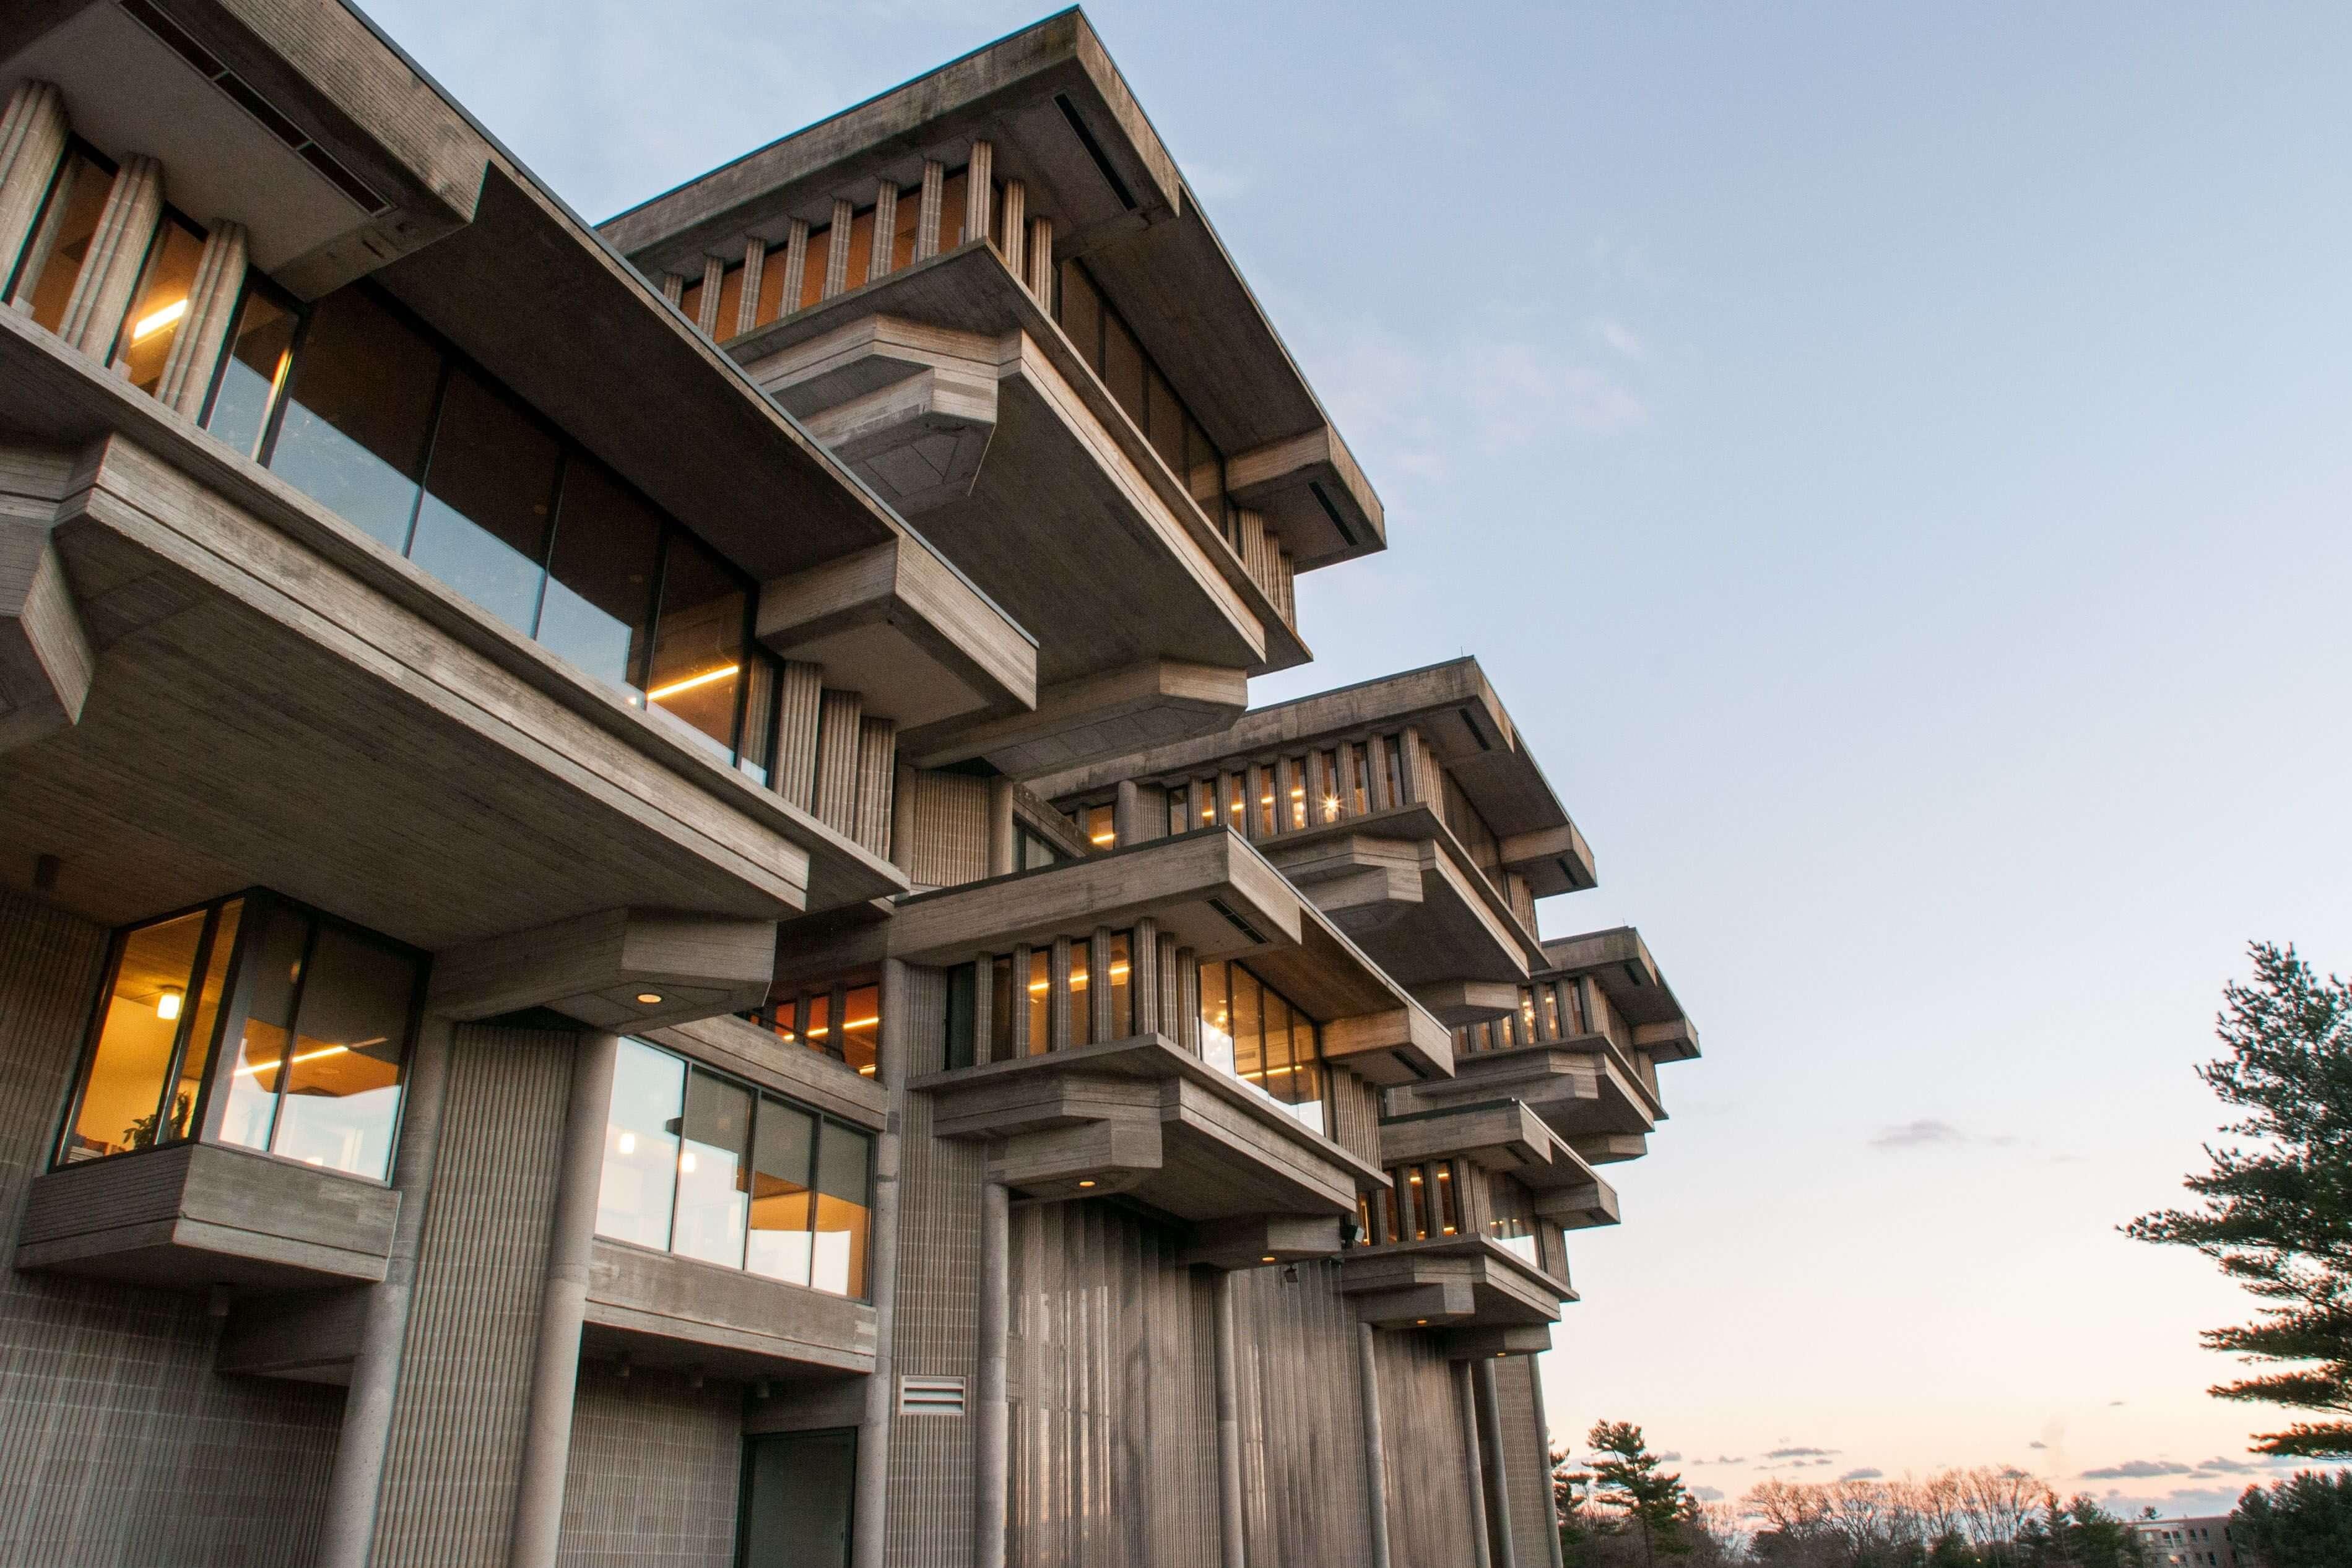 UMass Dartmouth: Where innovation meets creativity